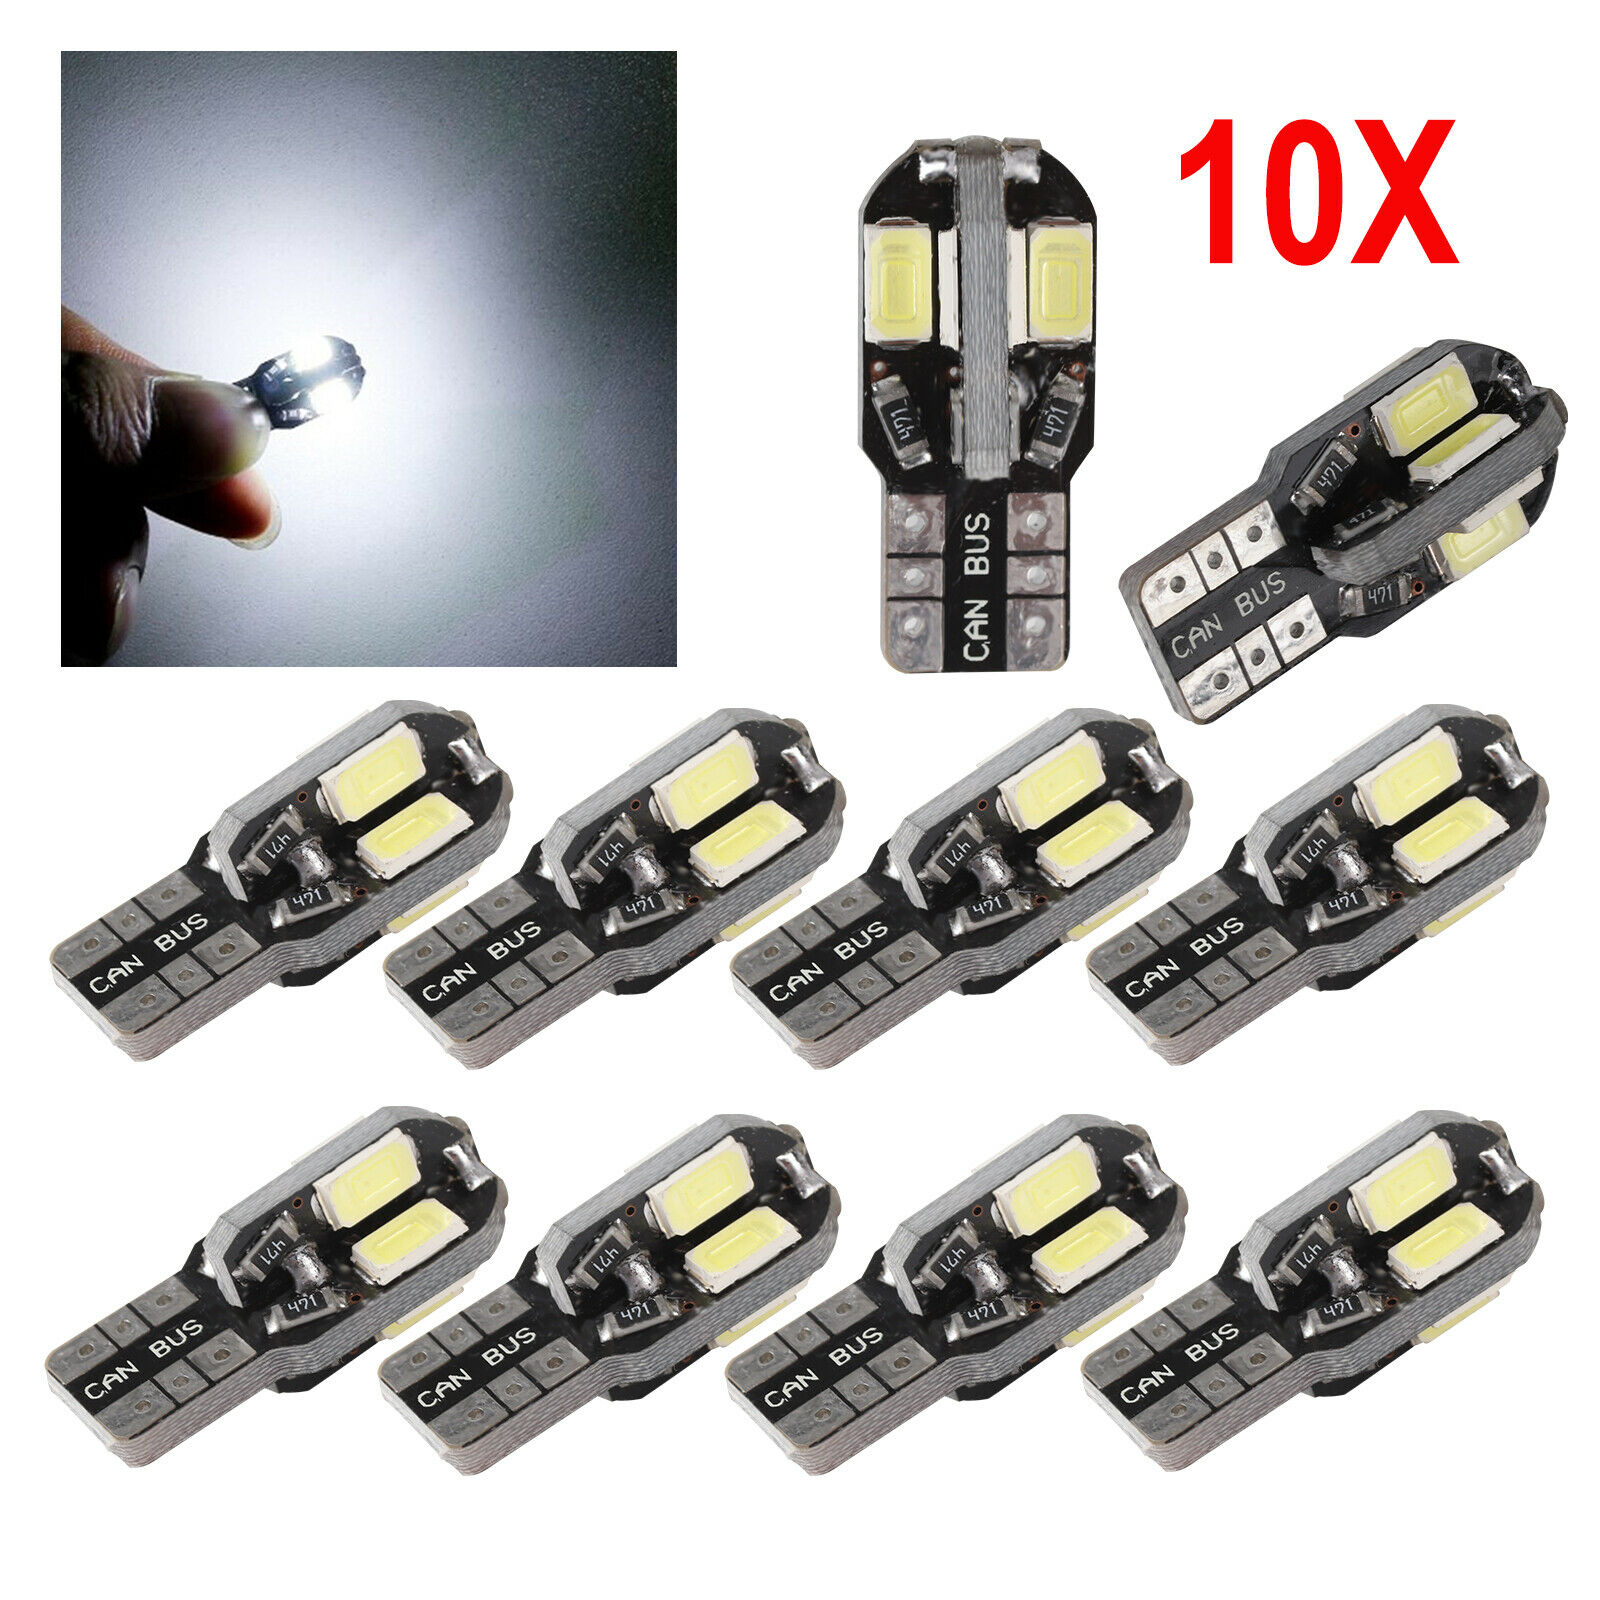 2x LED T10 168 Chip Glassockel Lampe 8 COB InnenraumBeleuchtung Deutsche Post